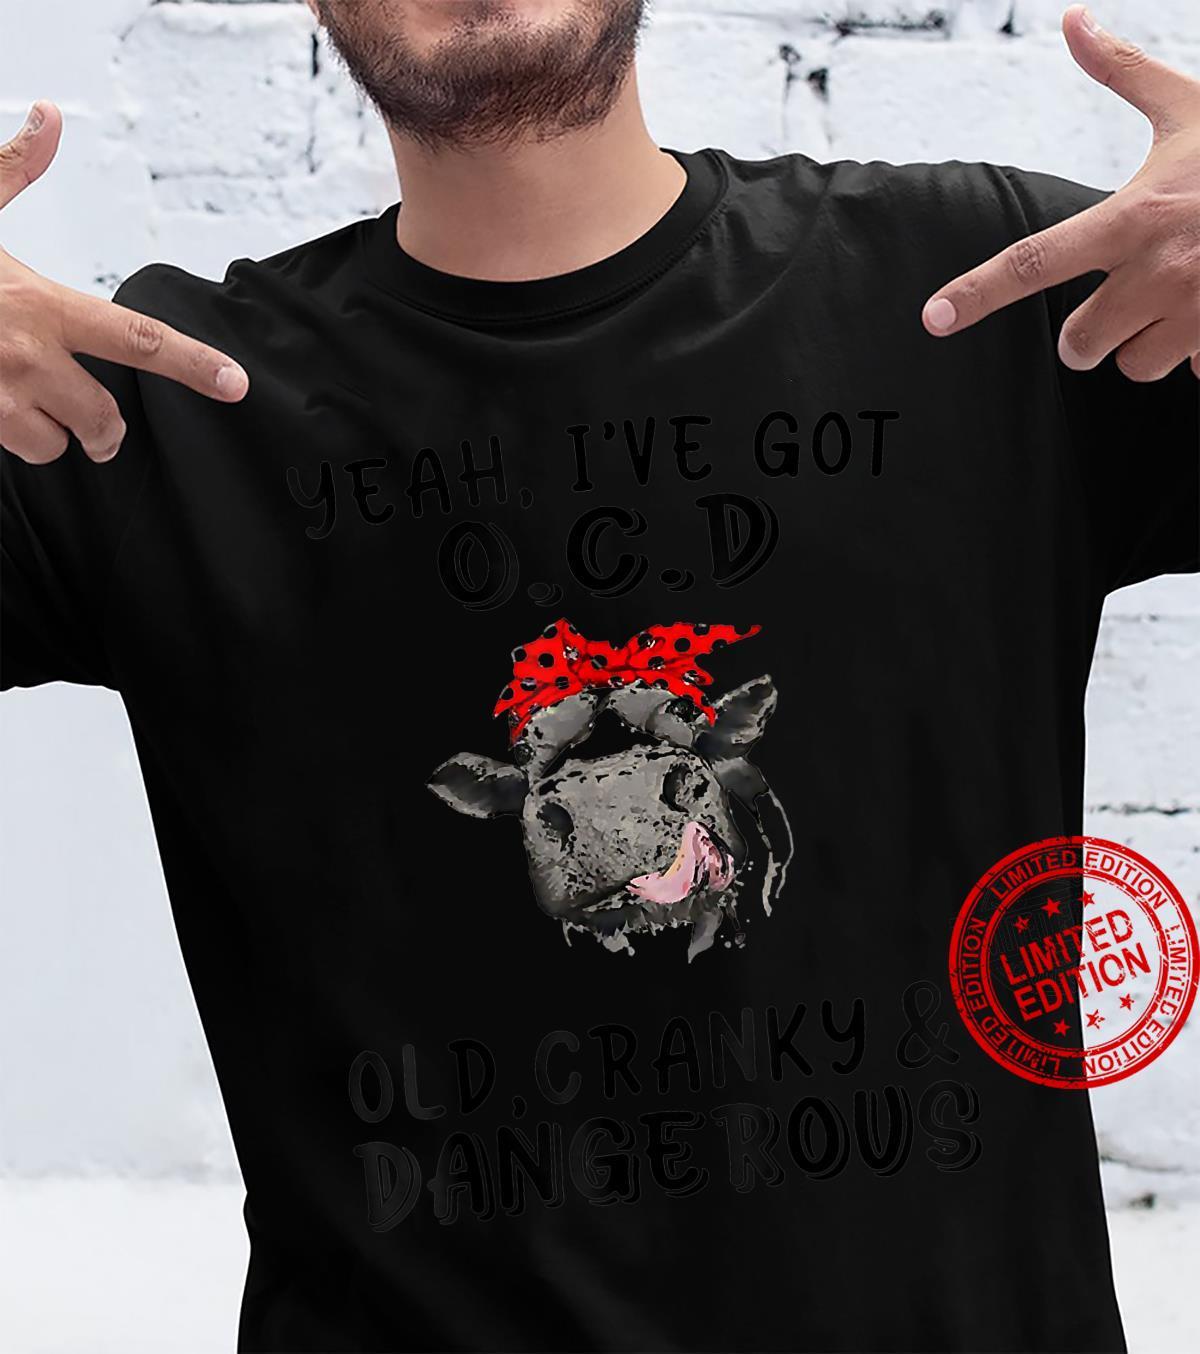 Heifer Yeah I've Got Ocd Old Crazy And Dangerous Shirt